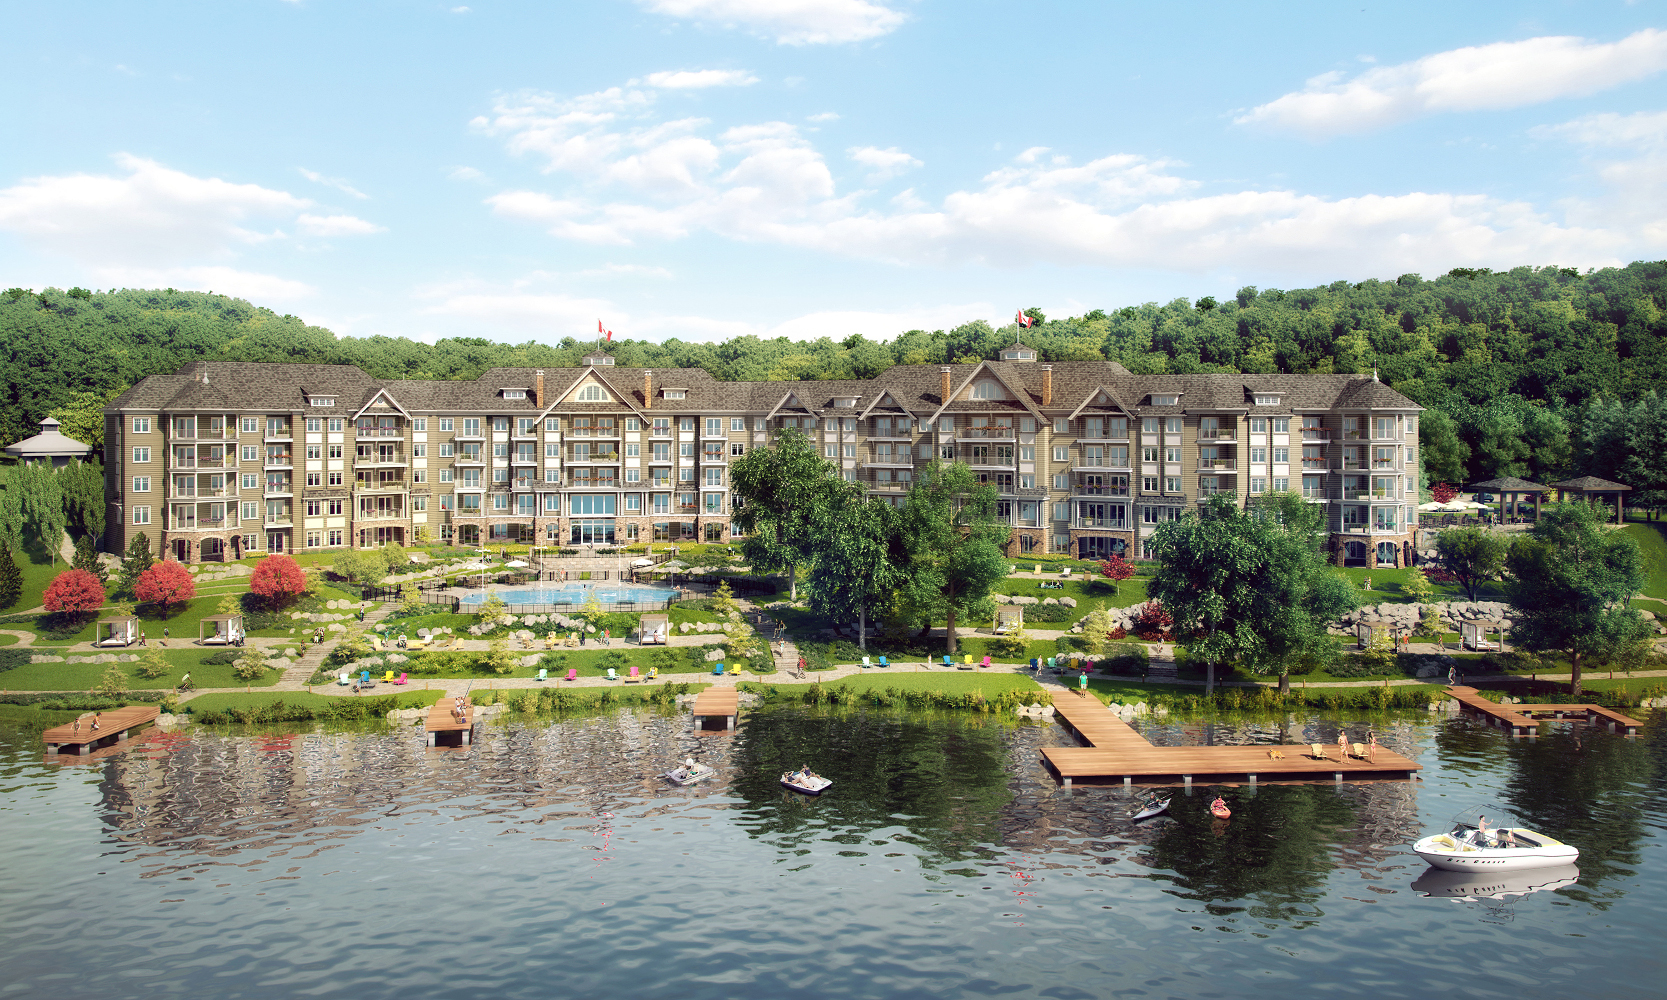 Become a Part of Muskoka History at Lakeside Lodge Image